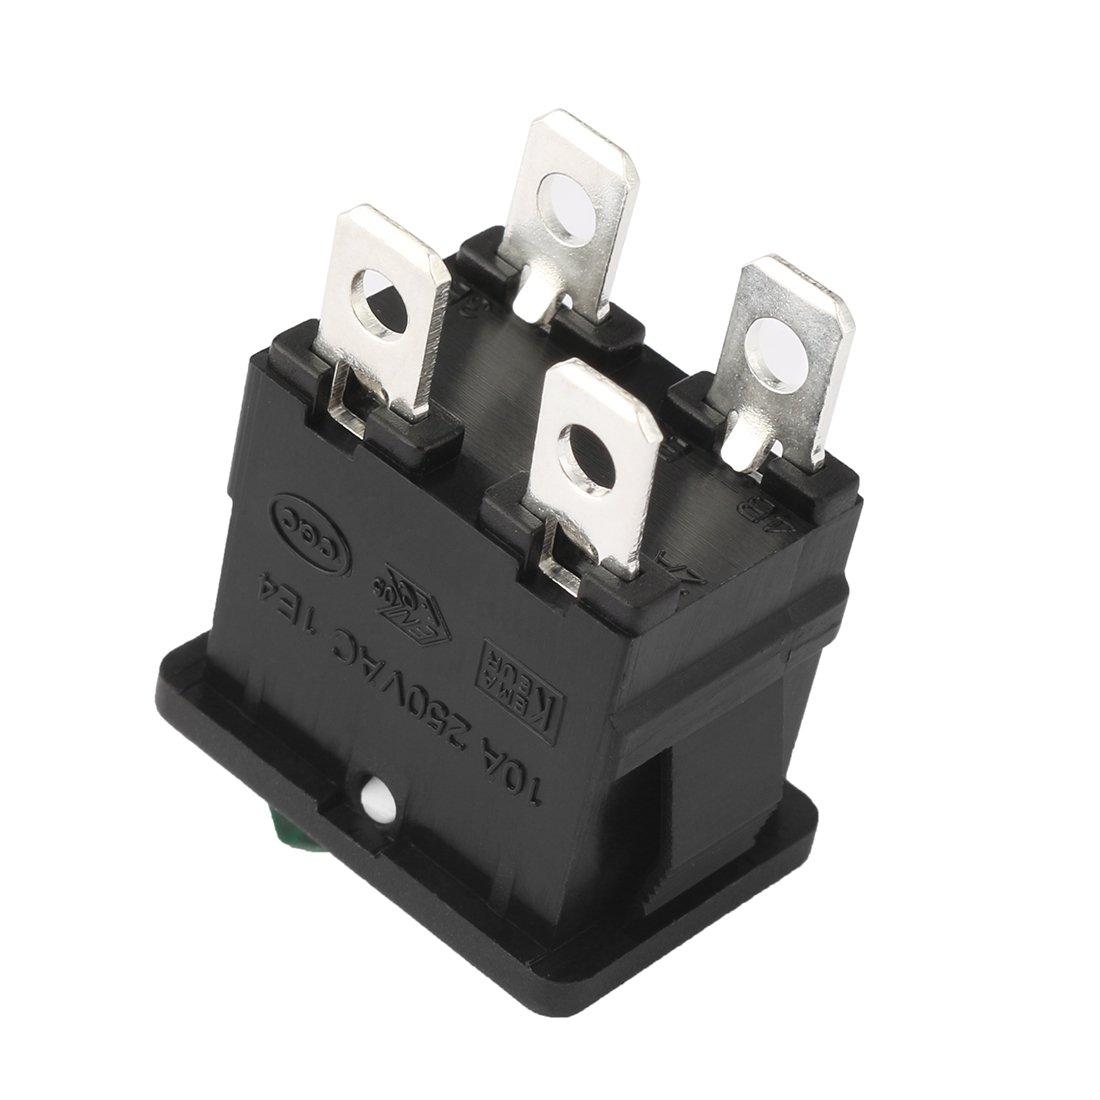 uxcell/® 2Pcs DPST On Off 4Pin ON//Off Green LED Light Boat Lights Rocker Switch Push Button Switch AC 20A//125V 22A//250V